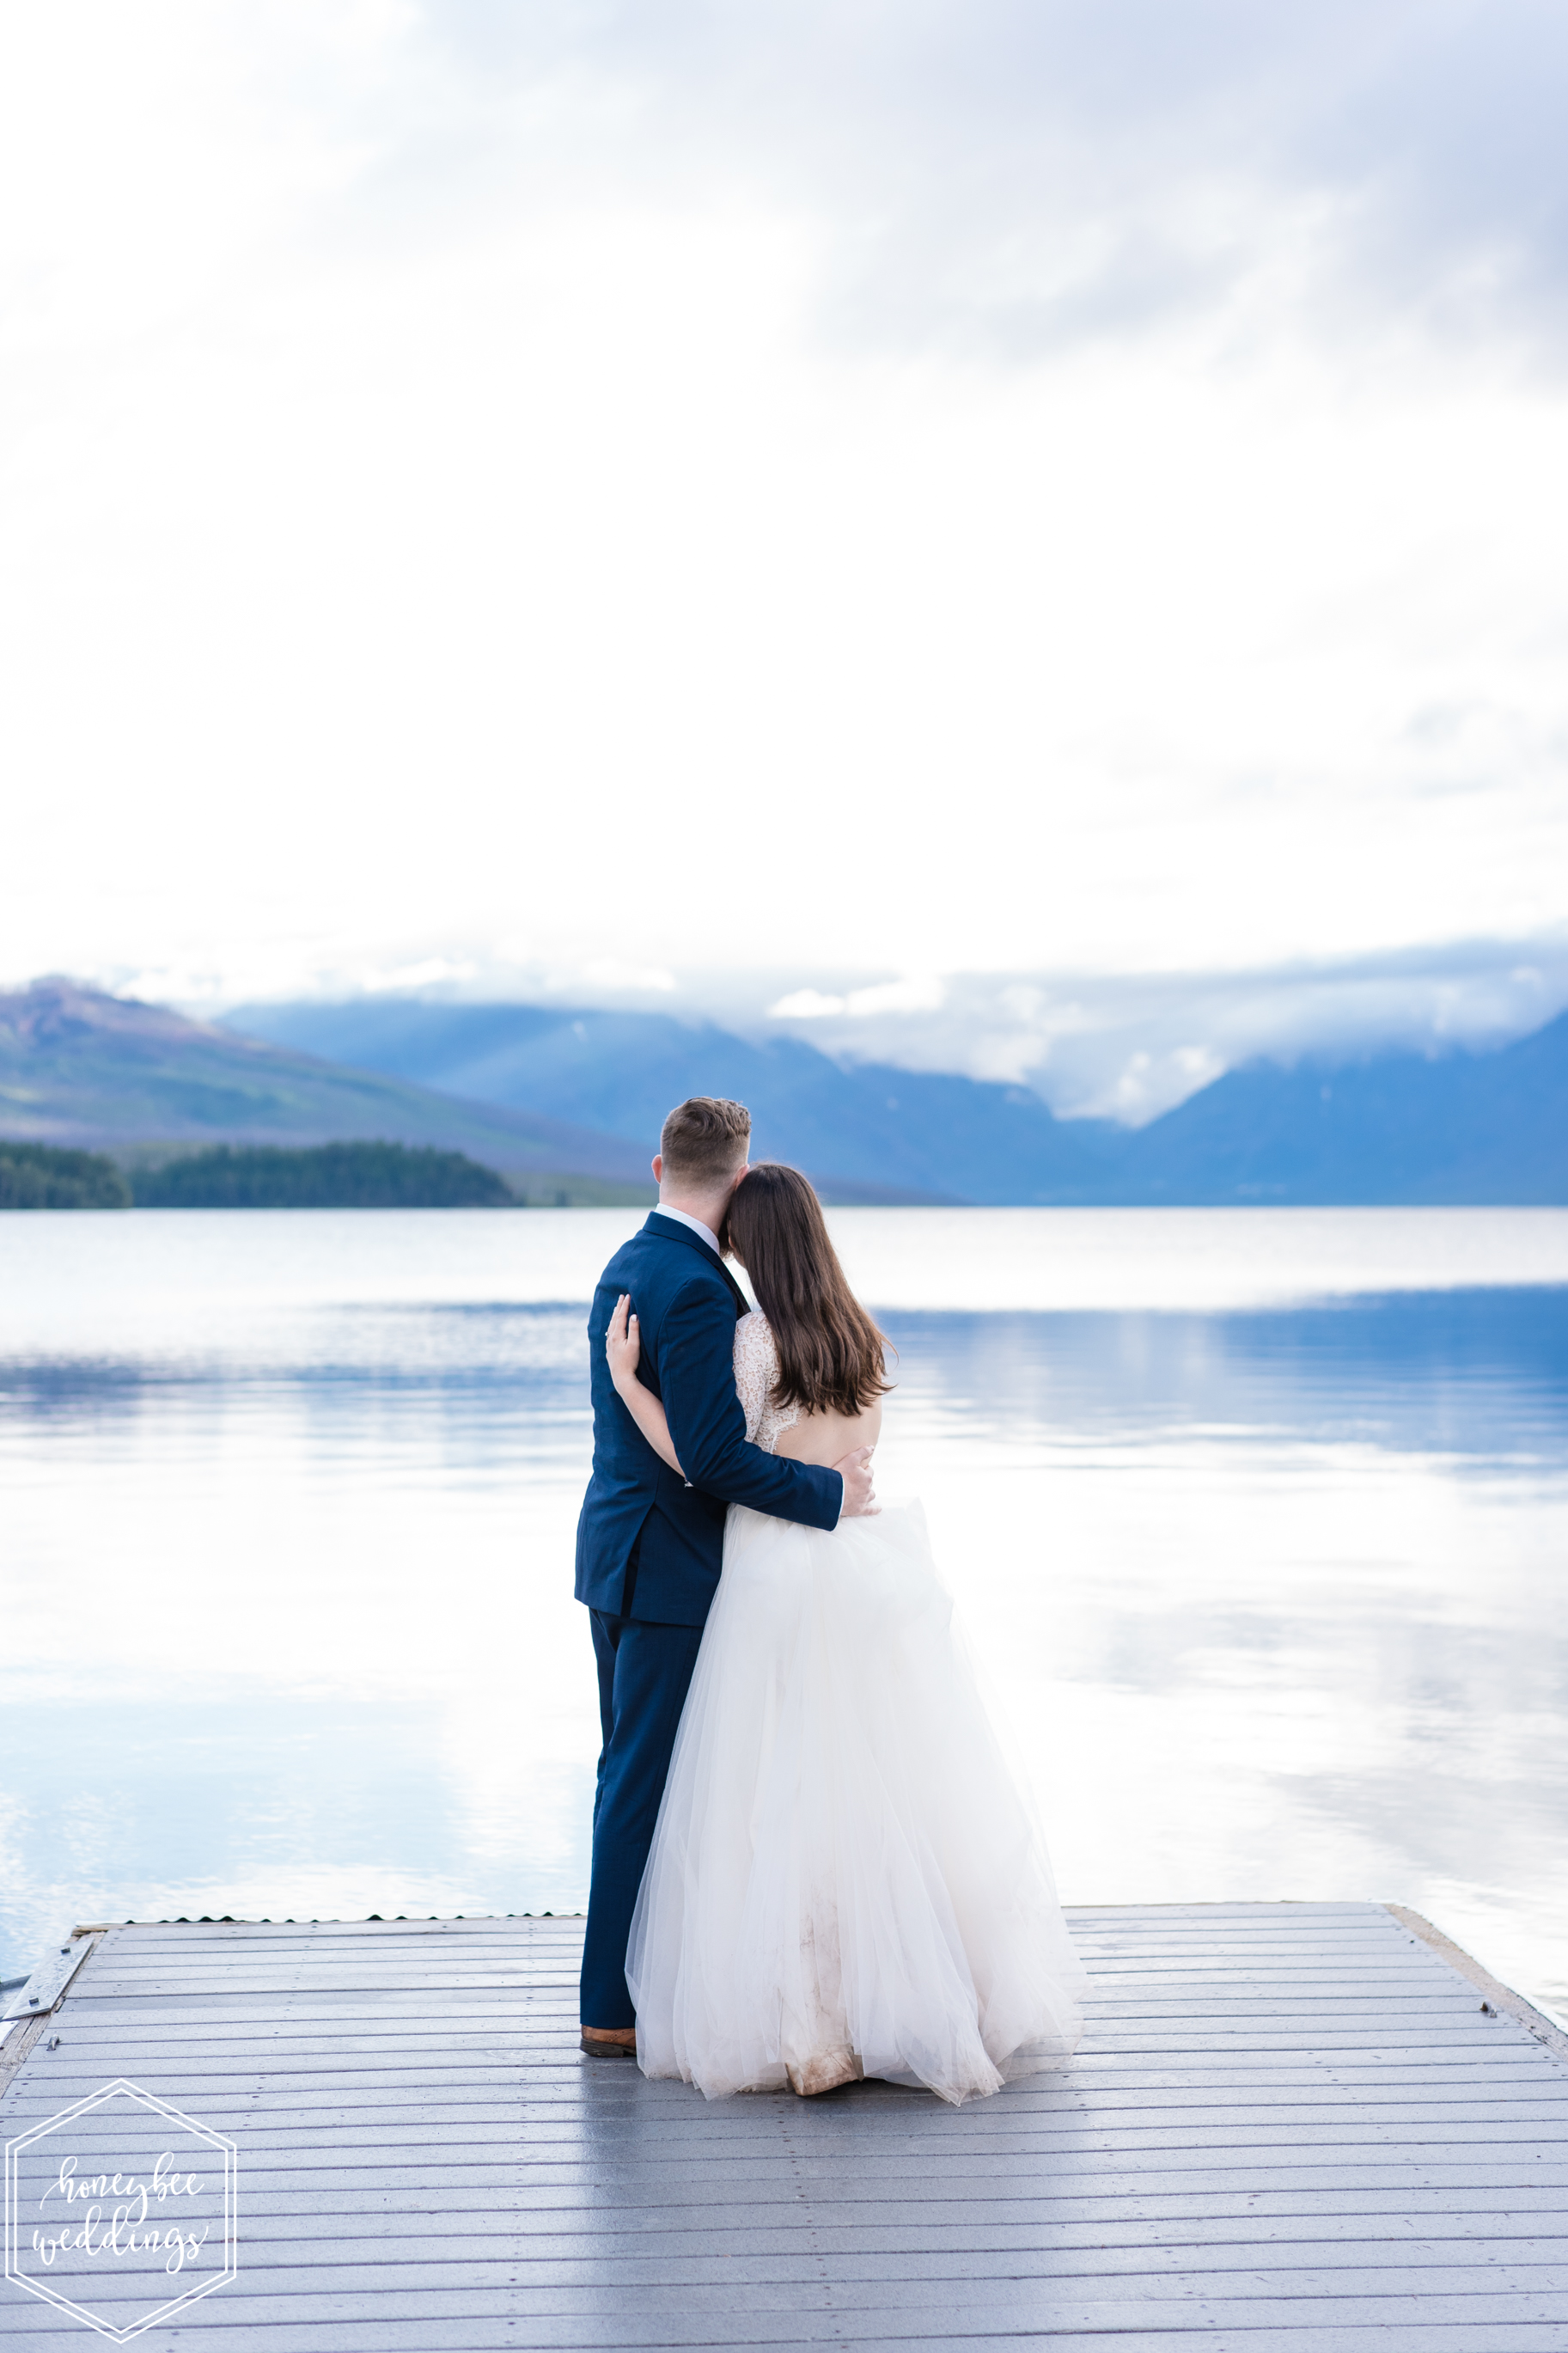 231Glacier National Park Wedding_Izaak Walton Inn Wedding_Honeybee Weddings_Norah & Kyle_June 09, 2019-51.jpg